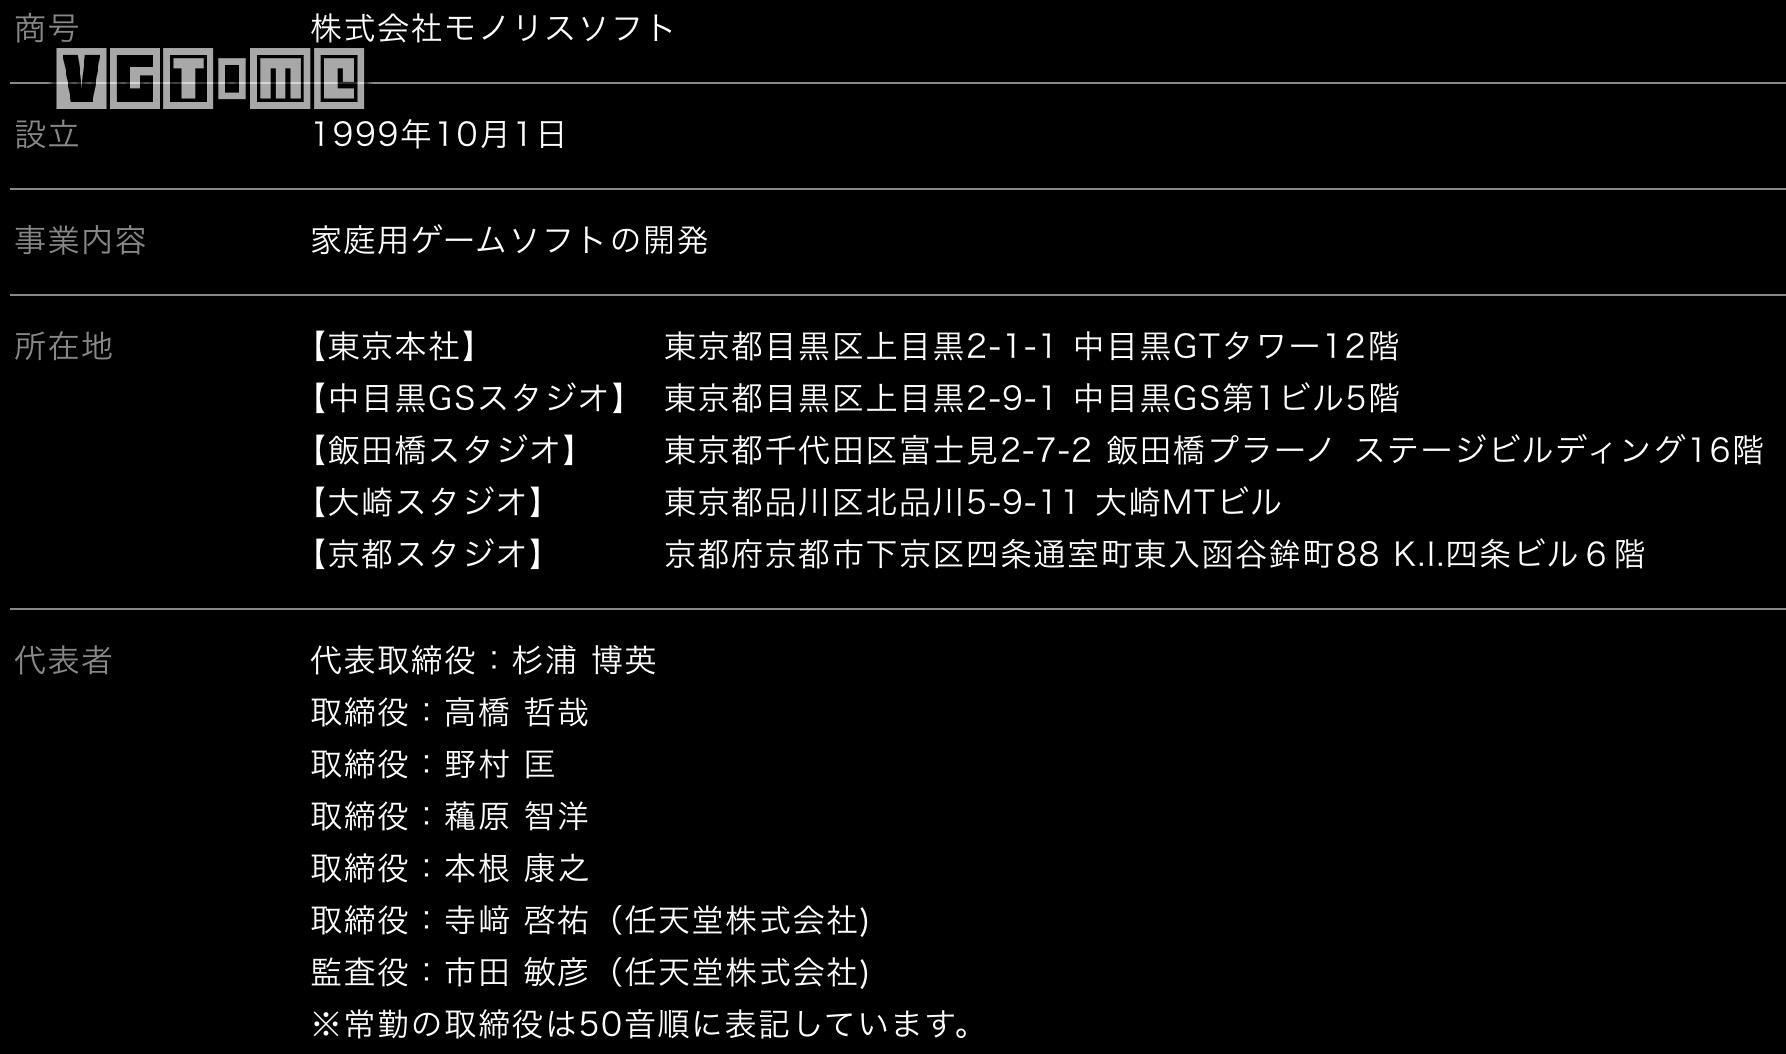 The developer of Alien Sword has added a new studio in Dazaki, Tokyo